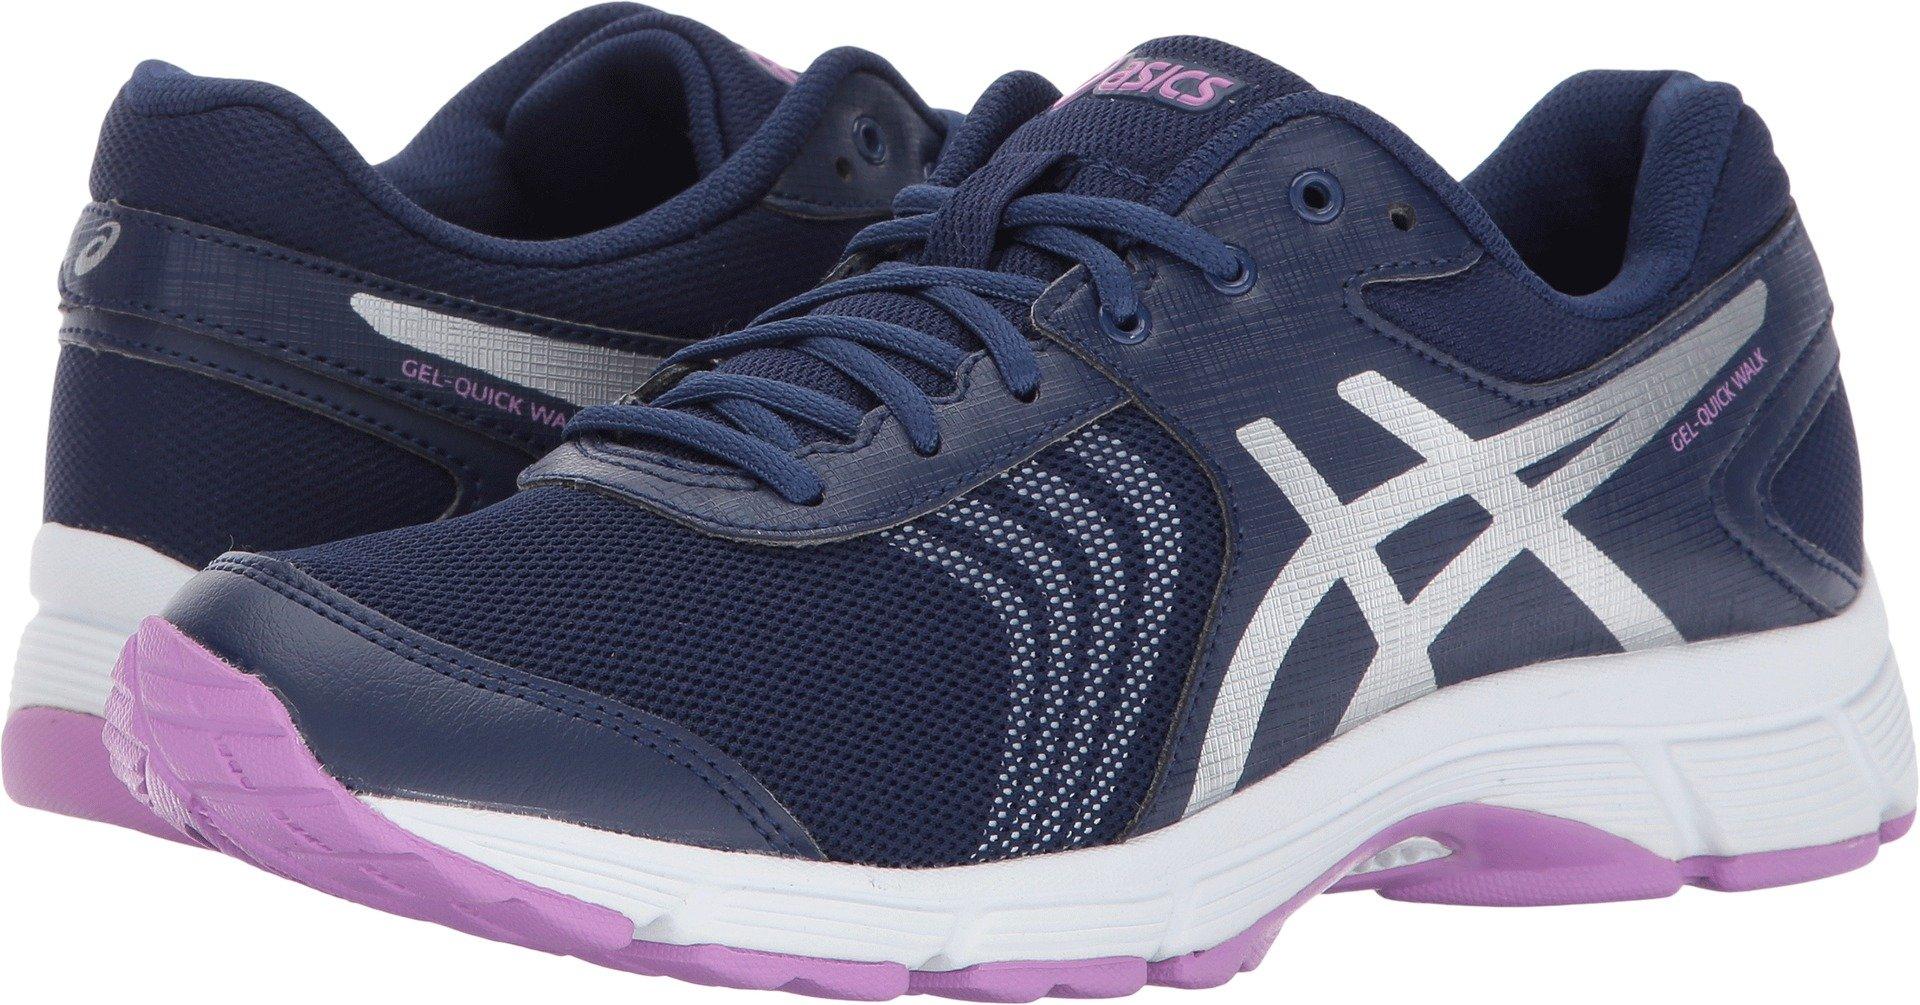 ASICS Women's Gel-Quickwalk 3 Walking Shoe, Indigo Blue/Silver/Violet, 8 Medium US